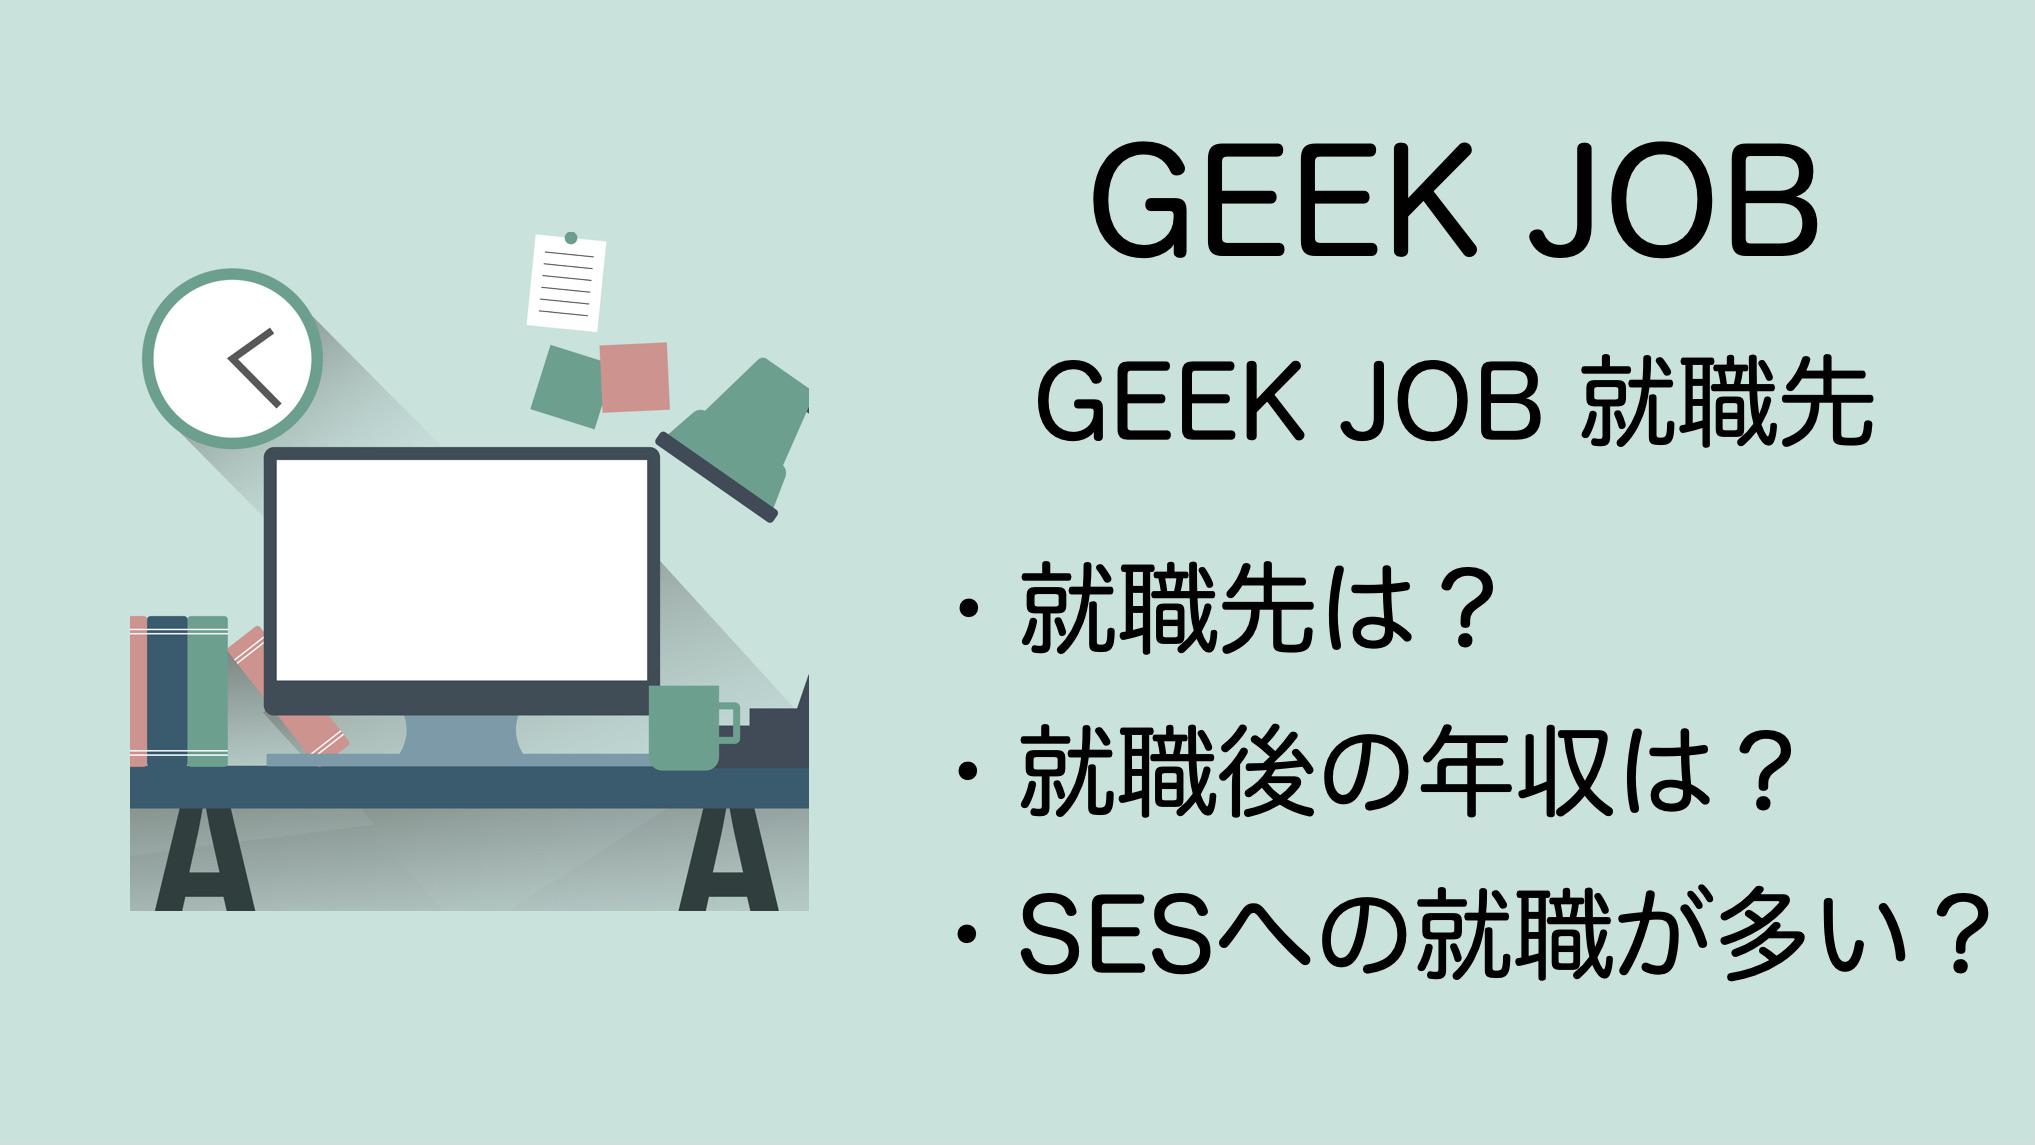 GEEKJOB(ギークジョブ)の就職先は?実績や年収についても解説!